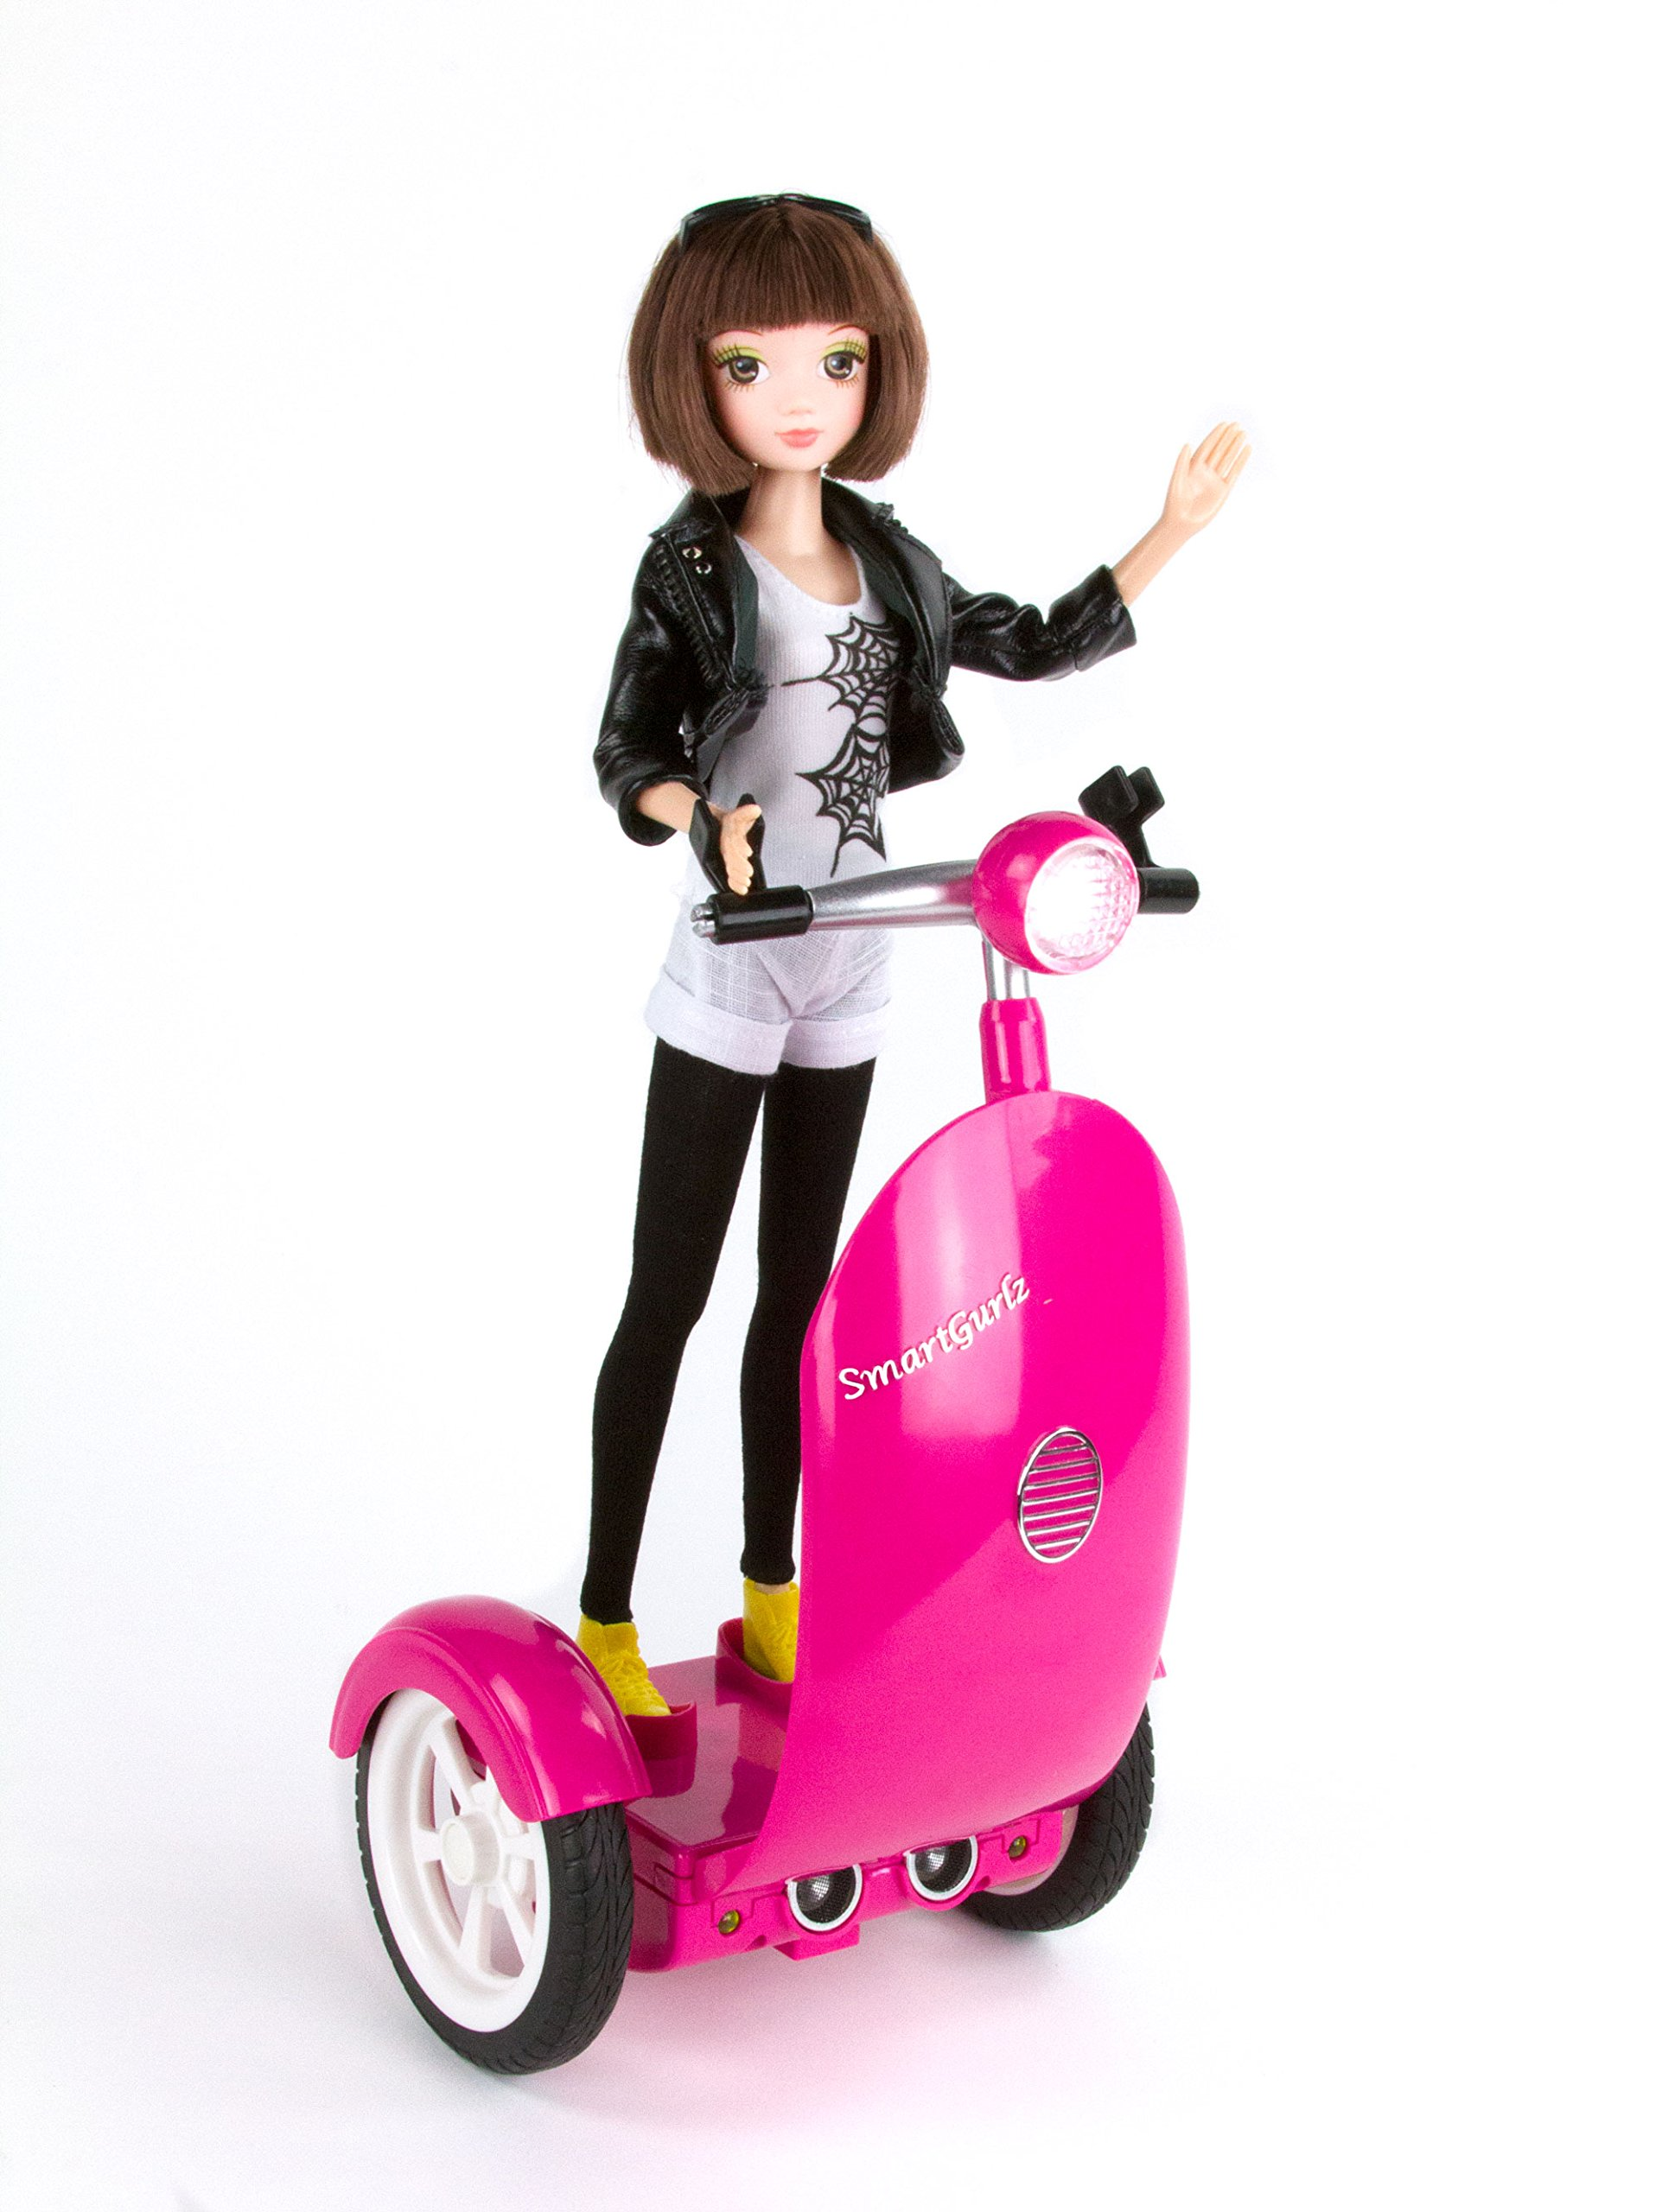 SmartGurlz with Jun Doll - App Controlled STEM Toy